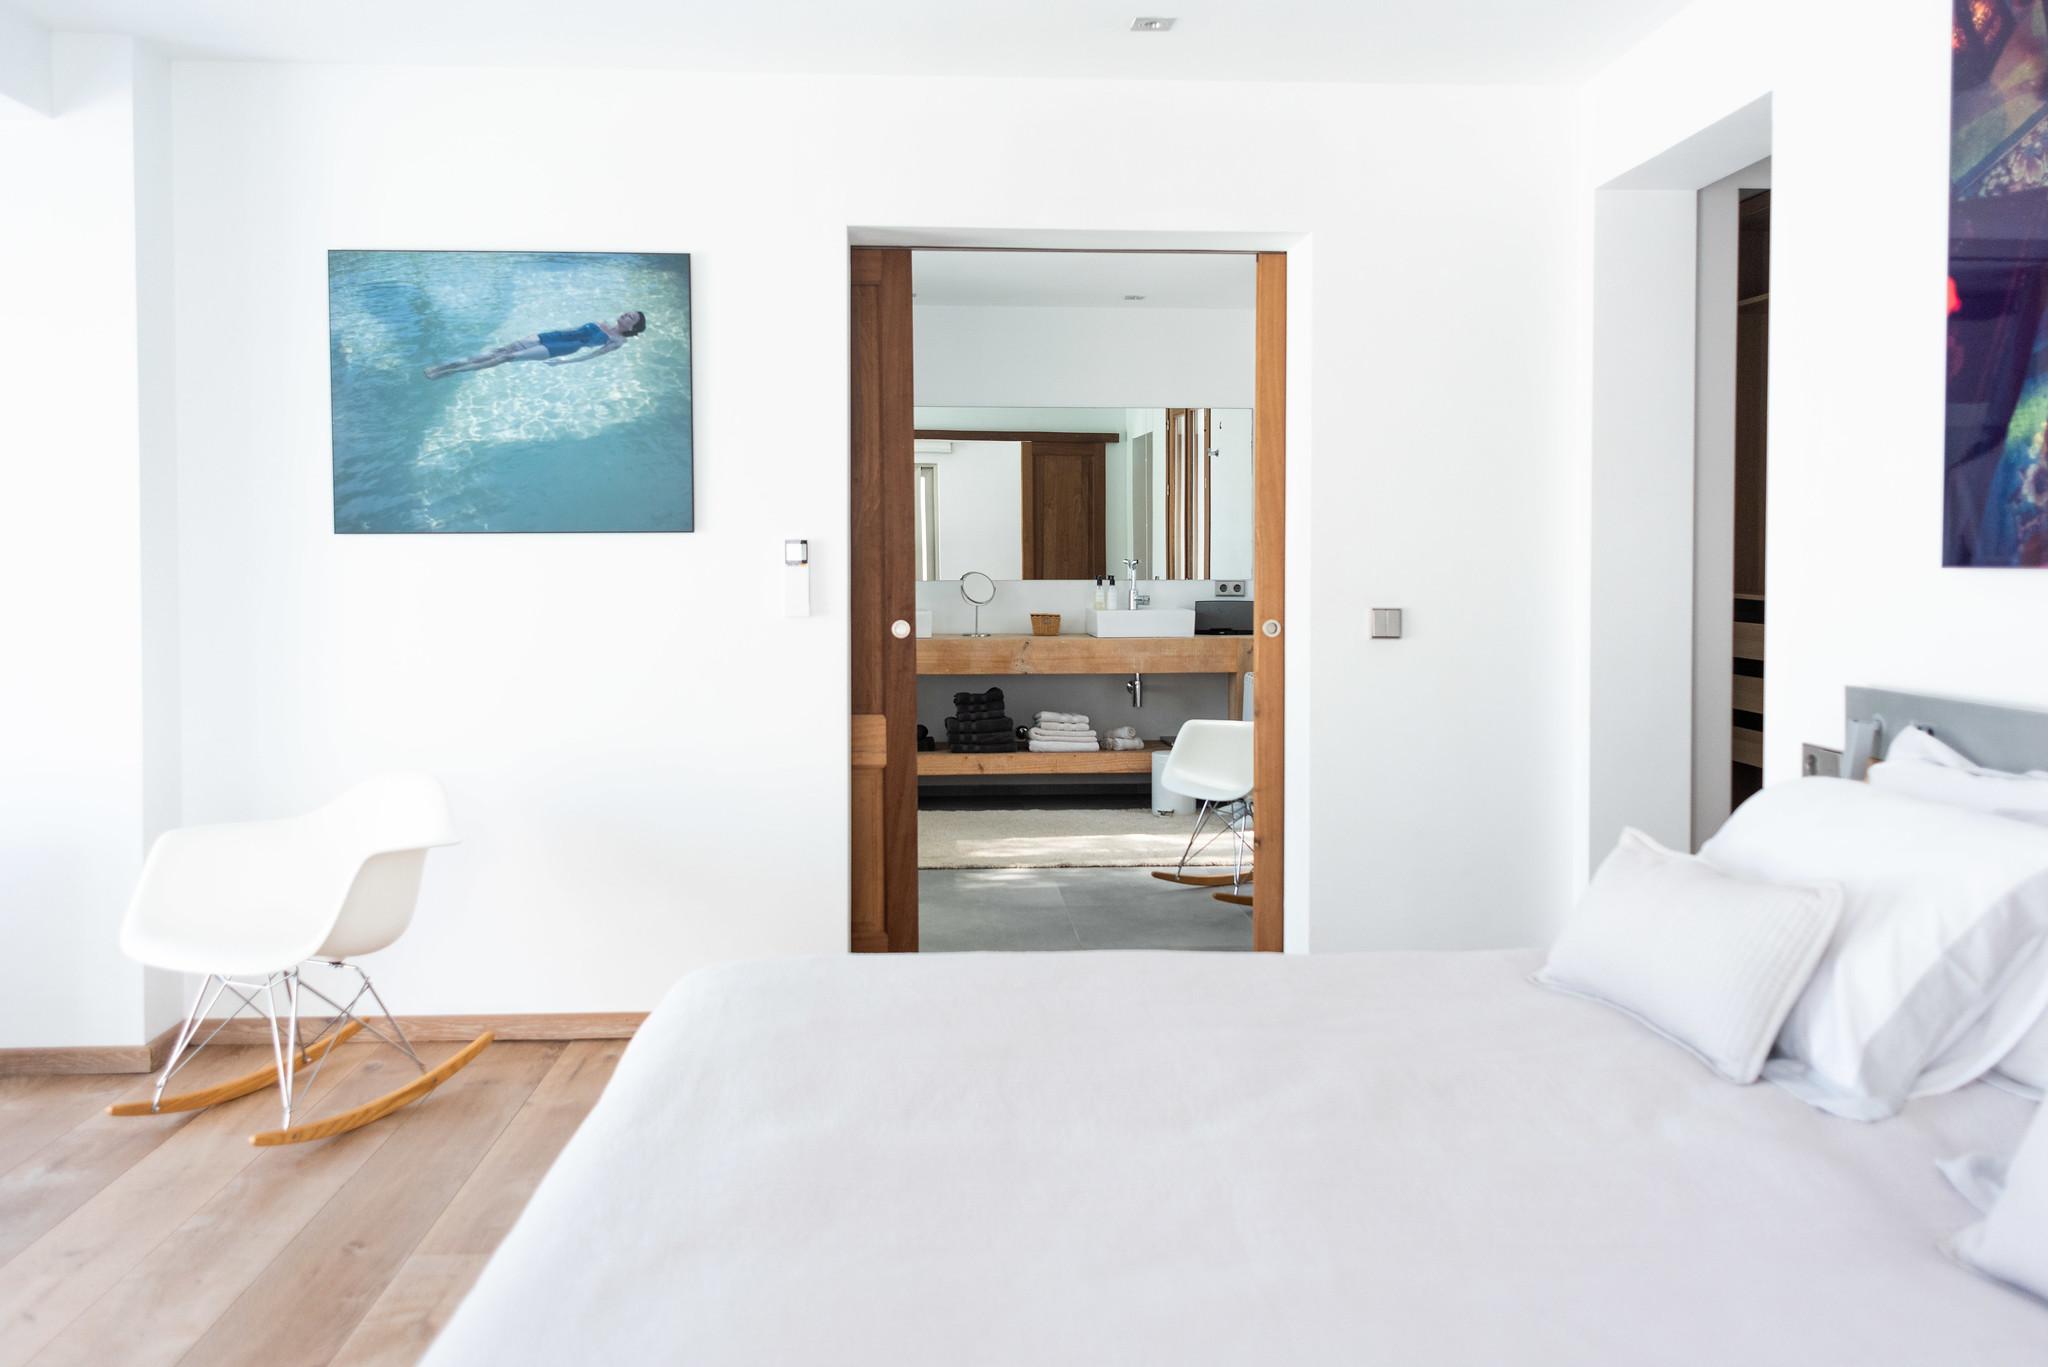 https://www.white-ibiza.com/wp-content/uploads/2020/05/white-ibiza-villas-can-dela-double-bedroom3.jpg